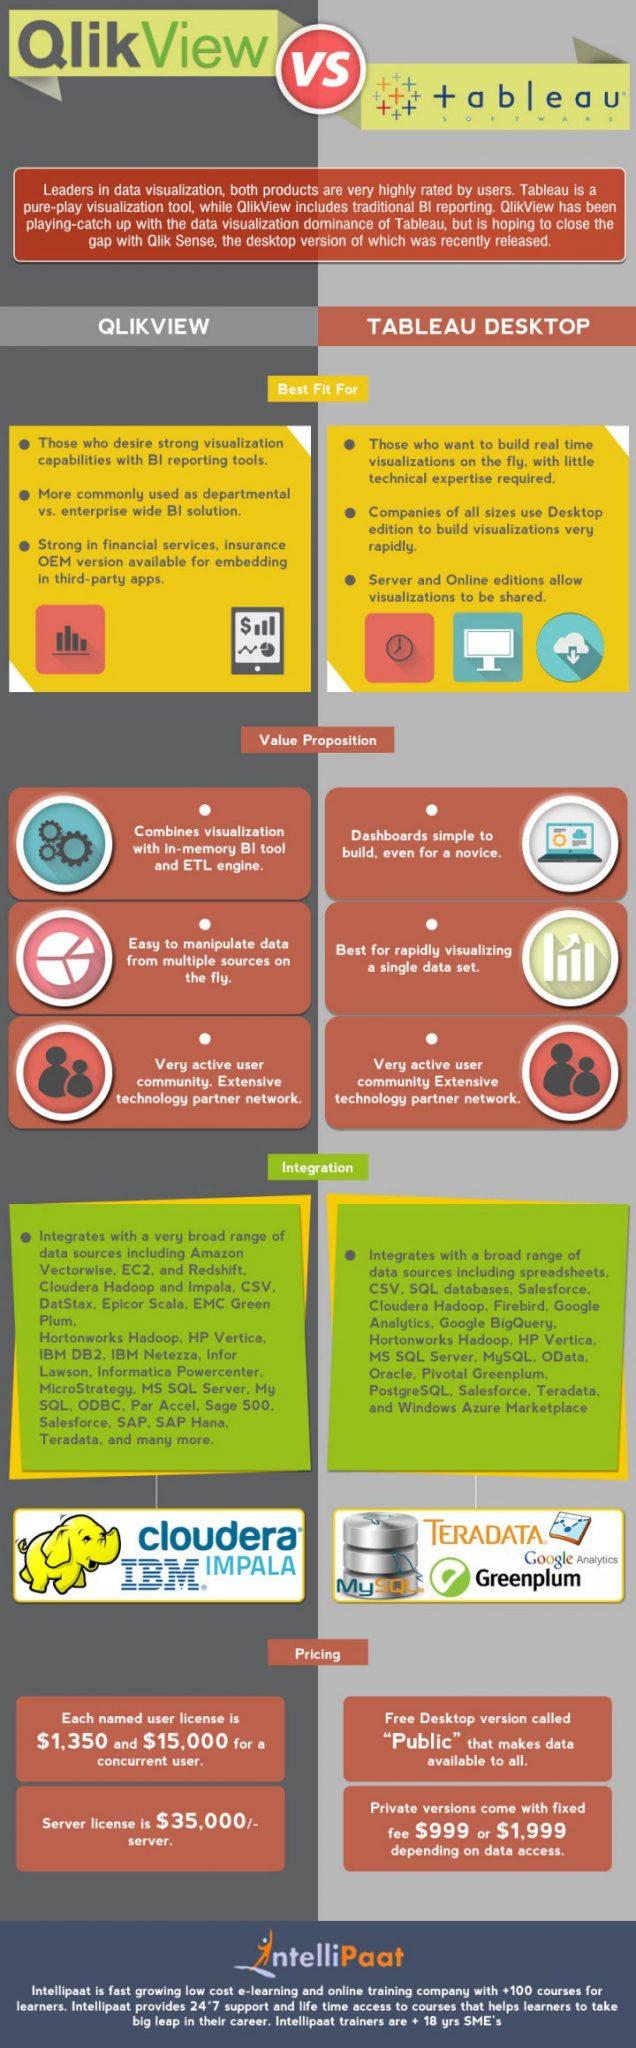 Qlikview vs Tableau - Infographic